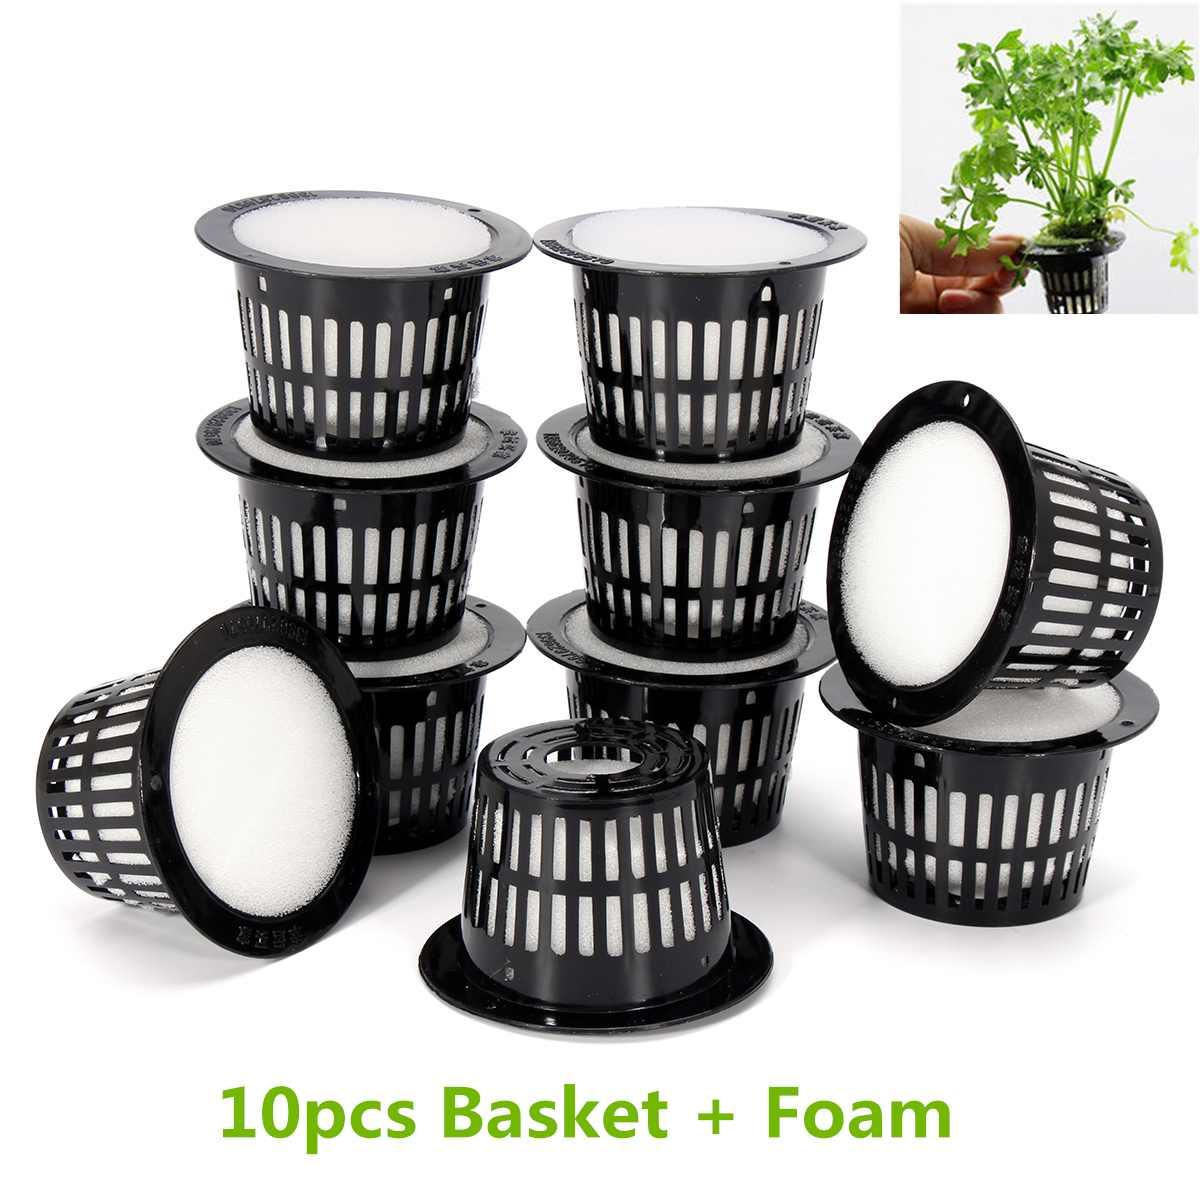 10Pcs Mesh Pot Net Cup Basket Hydroponic System Garden Plant Grow Vegetable Cloning Foam Insert Seed